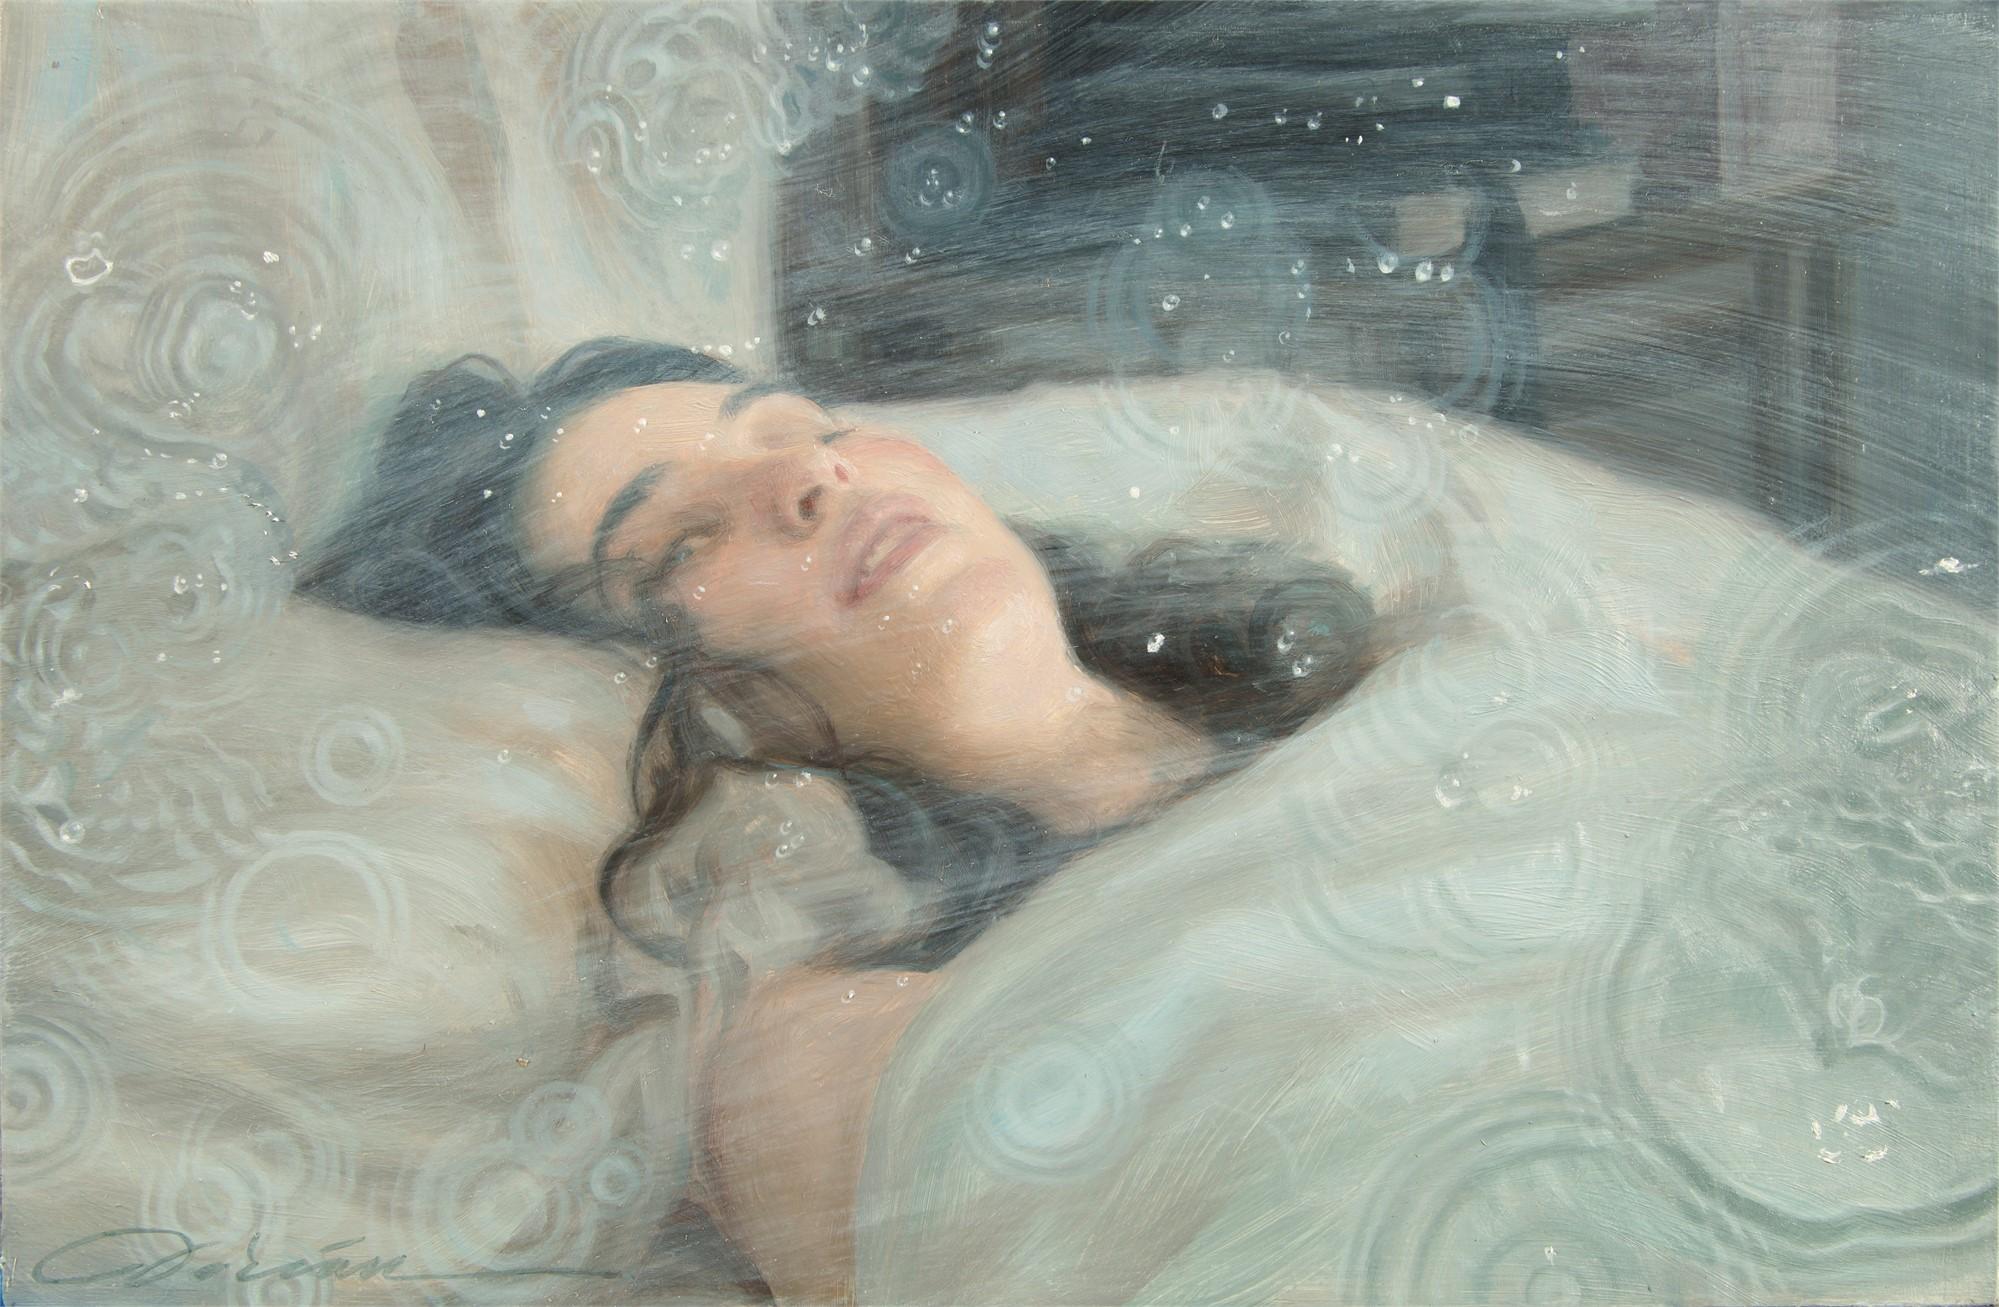 Reality Distortion Field by Dorian Vallejo